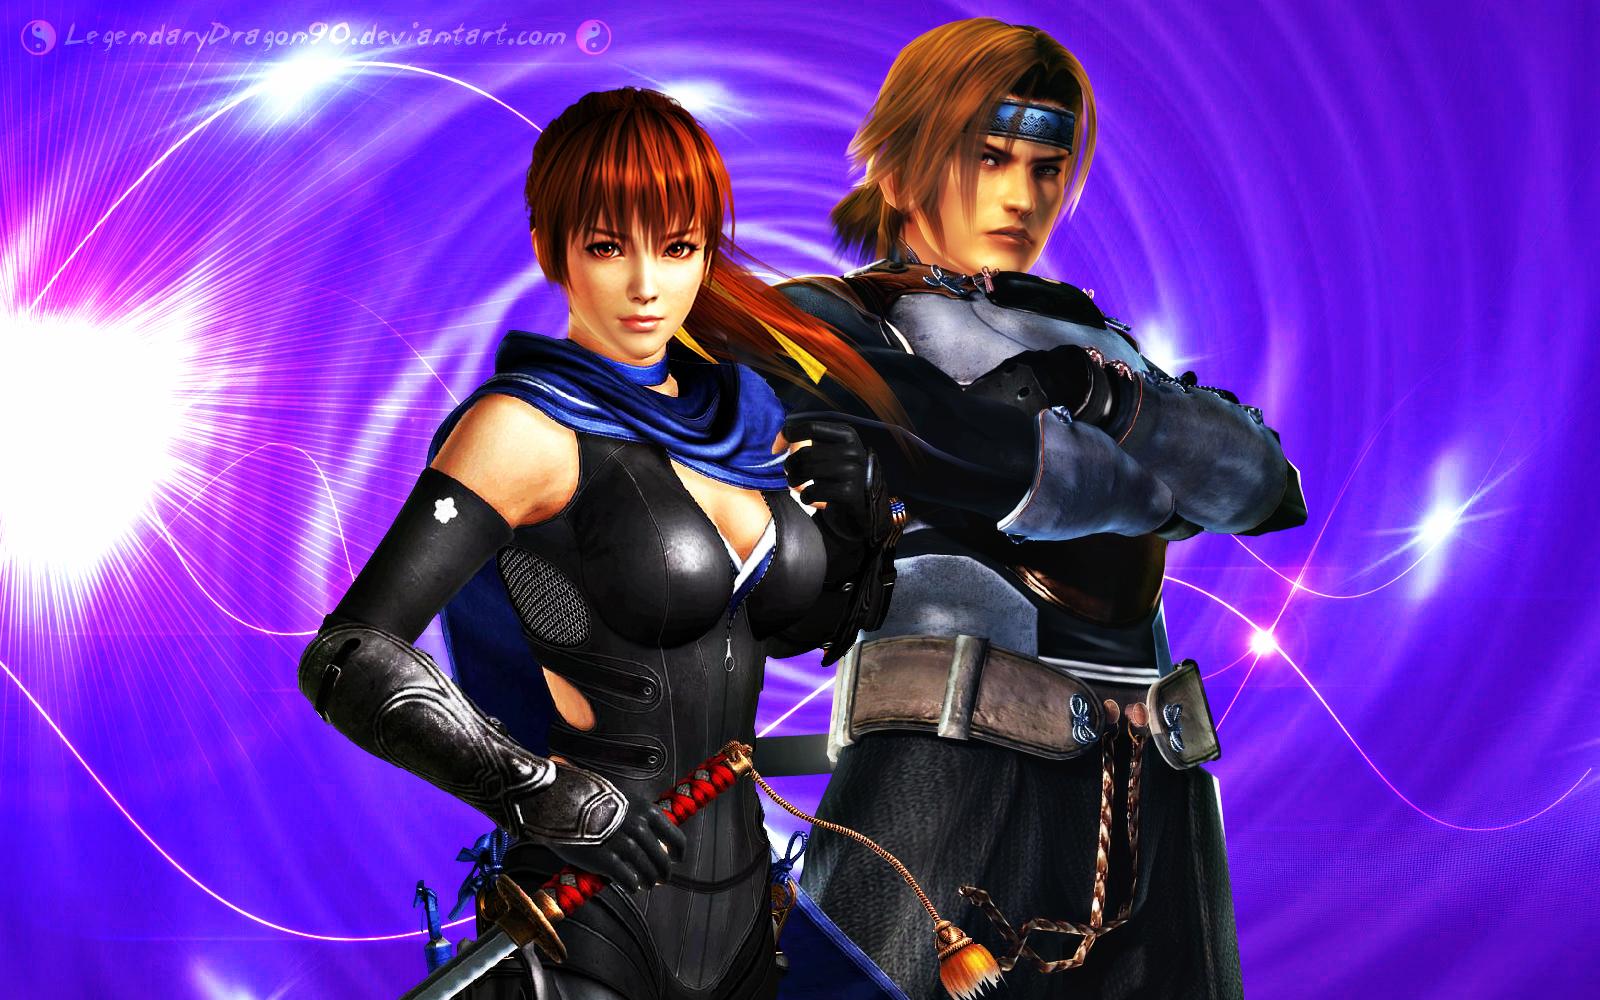 Ninja Siblings - Kasumi and Hayate by LegendaryDragon90